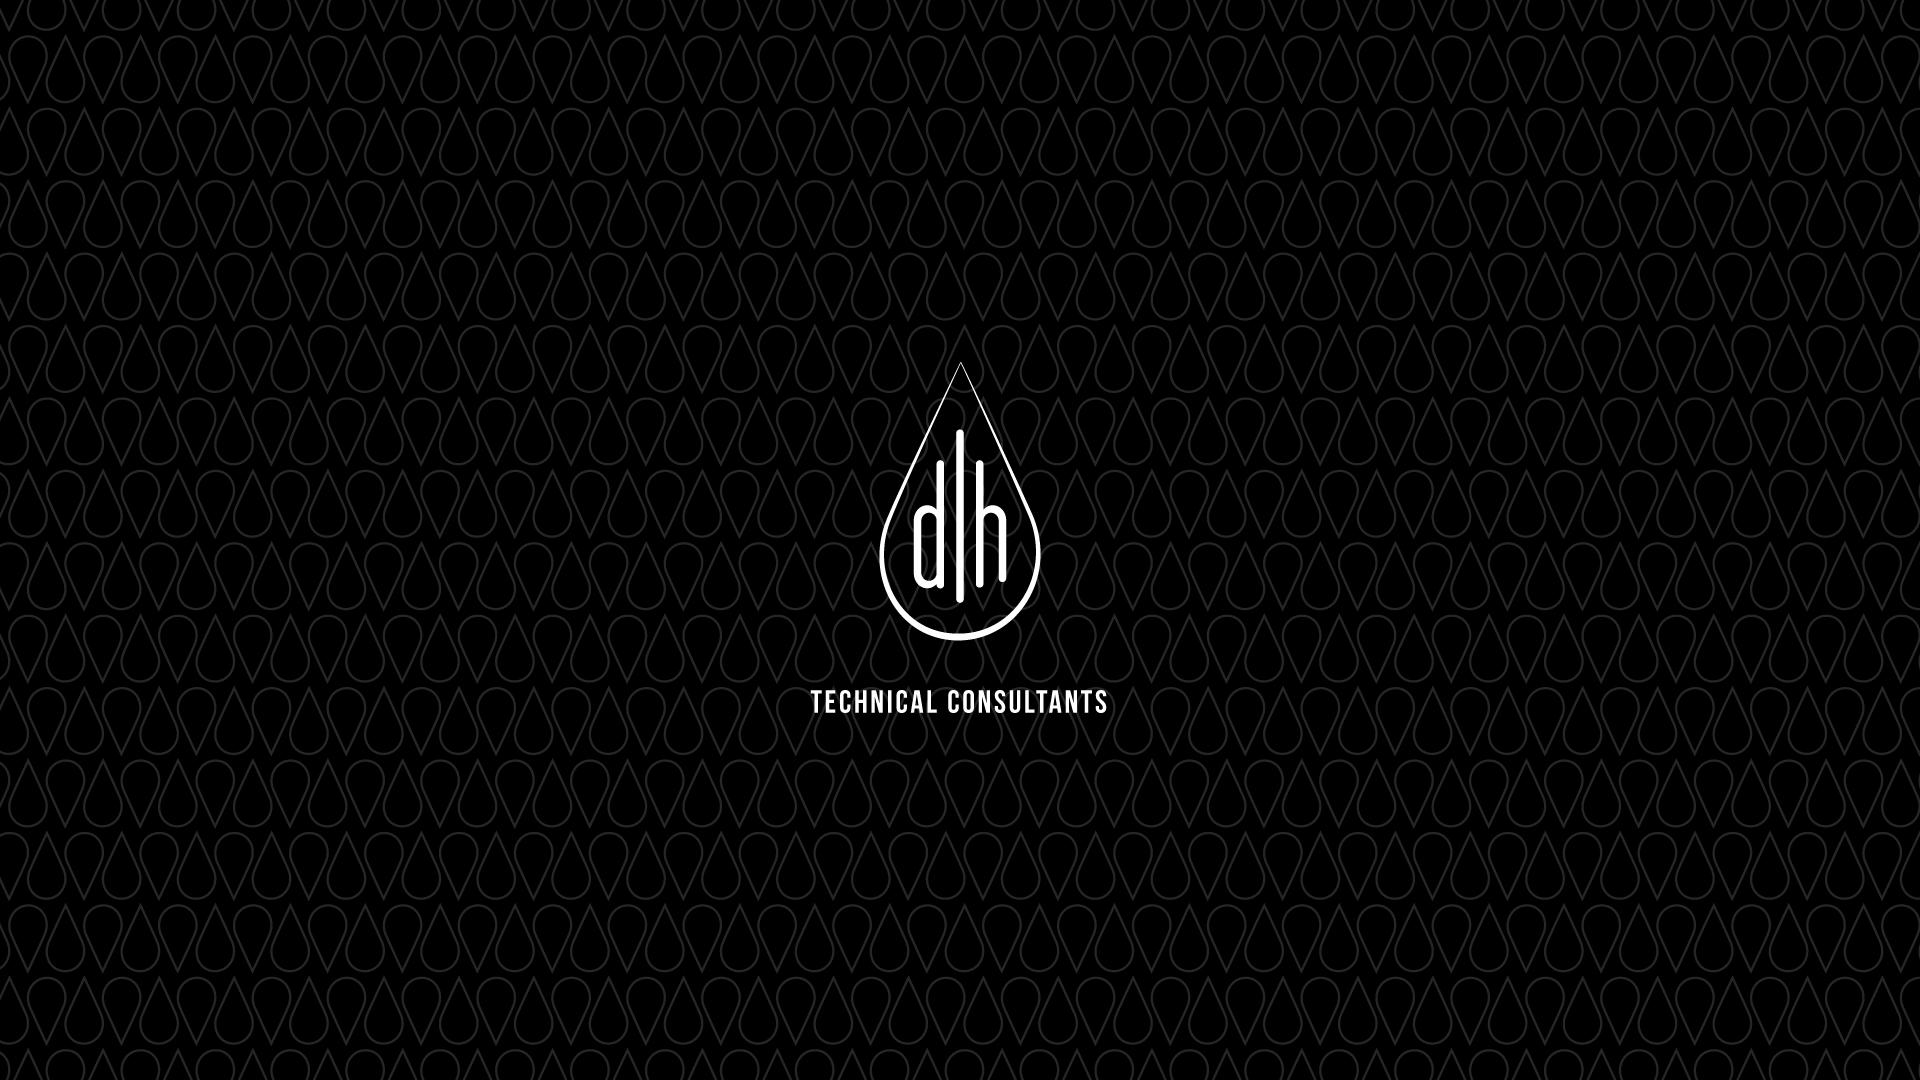 DHL - Branding   The Underground Design Studio